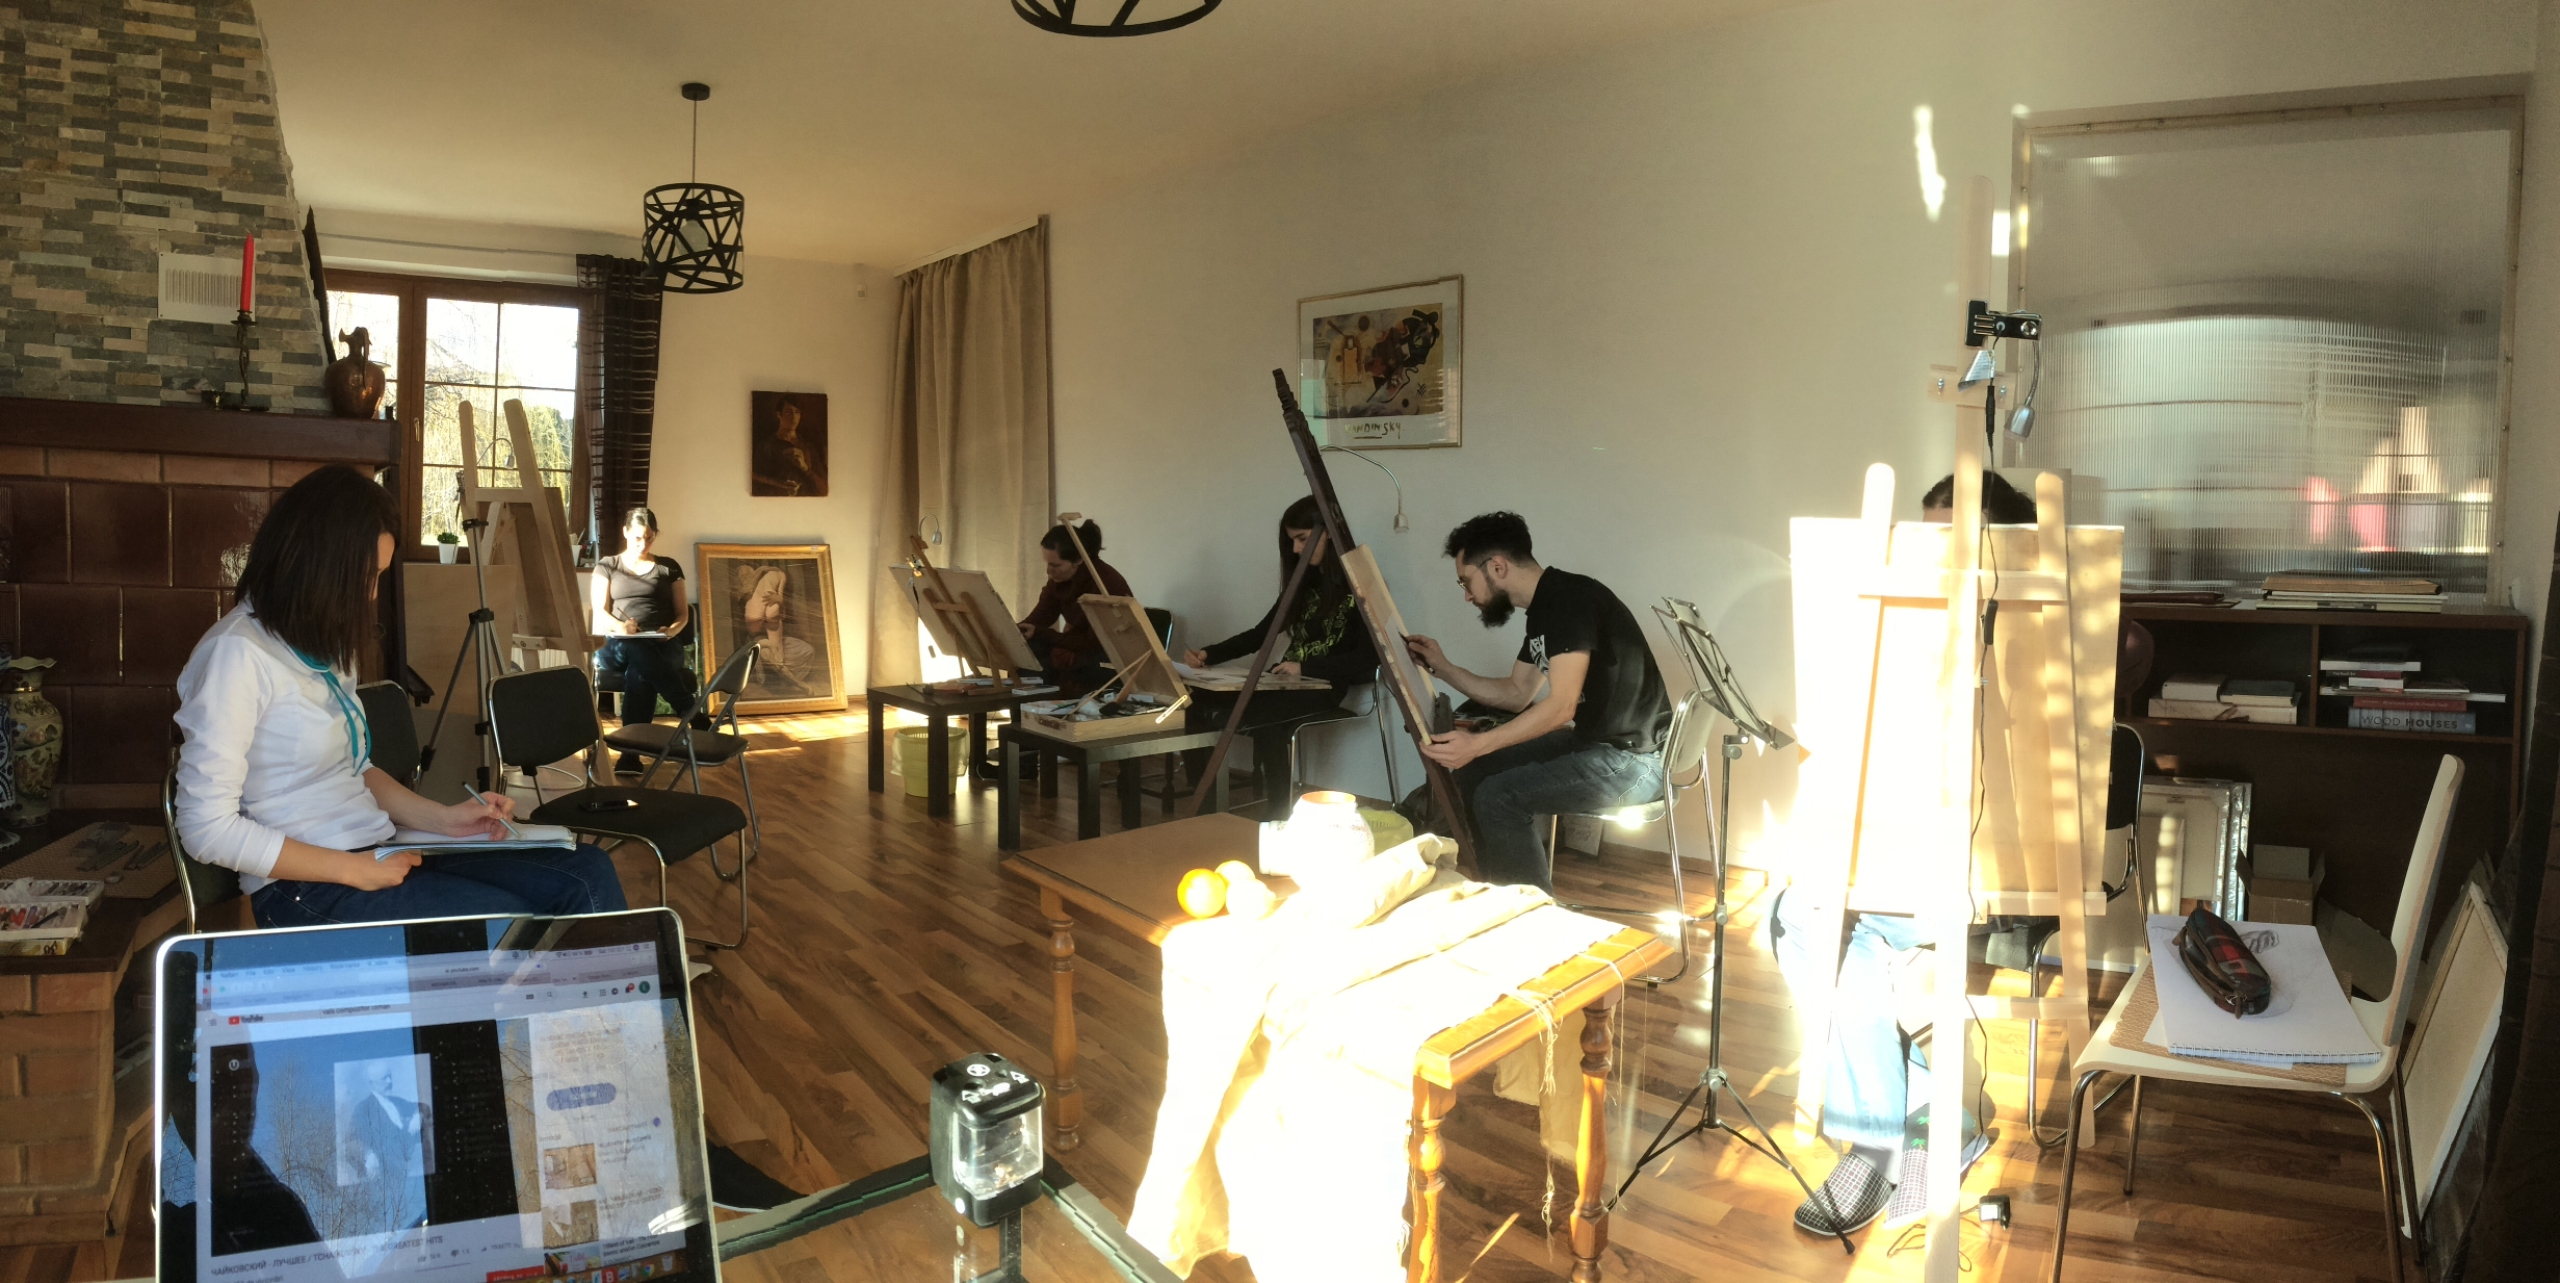 Atelier de pictura si dese (@atelierpicturadesen) Cover Image